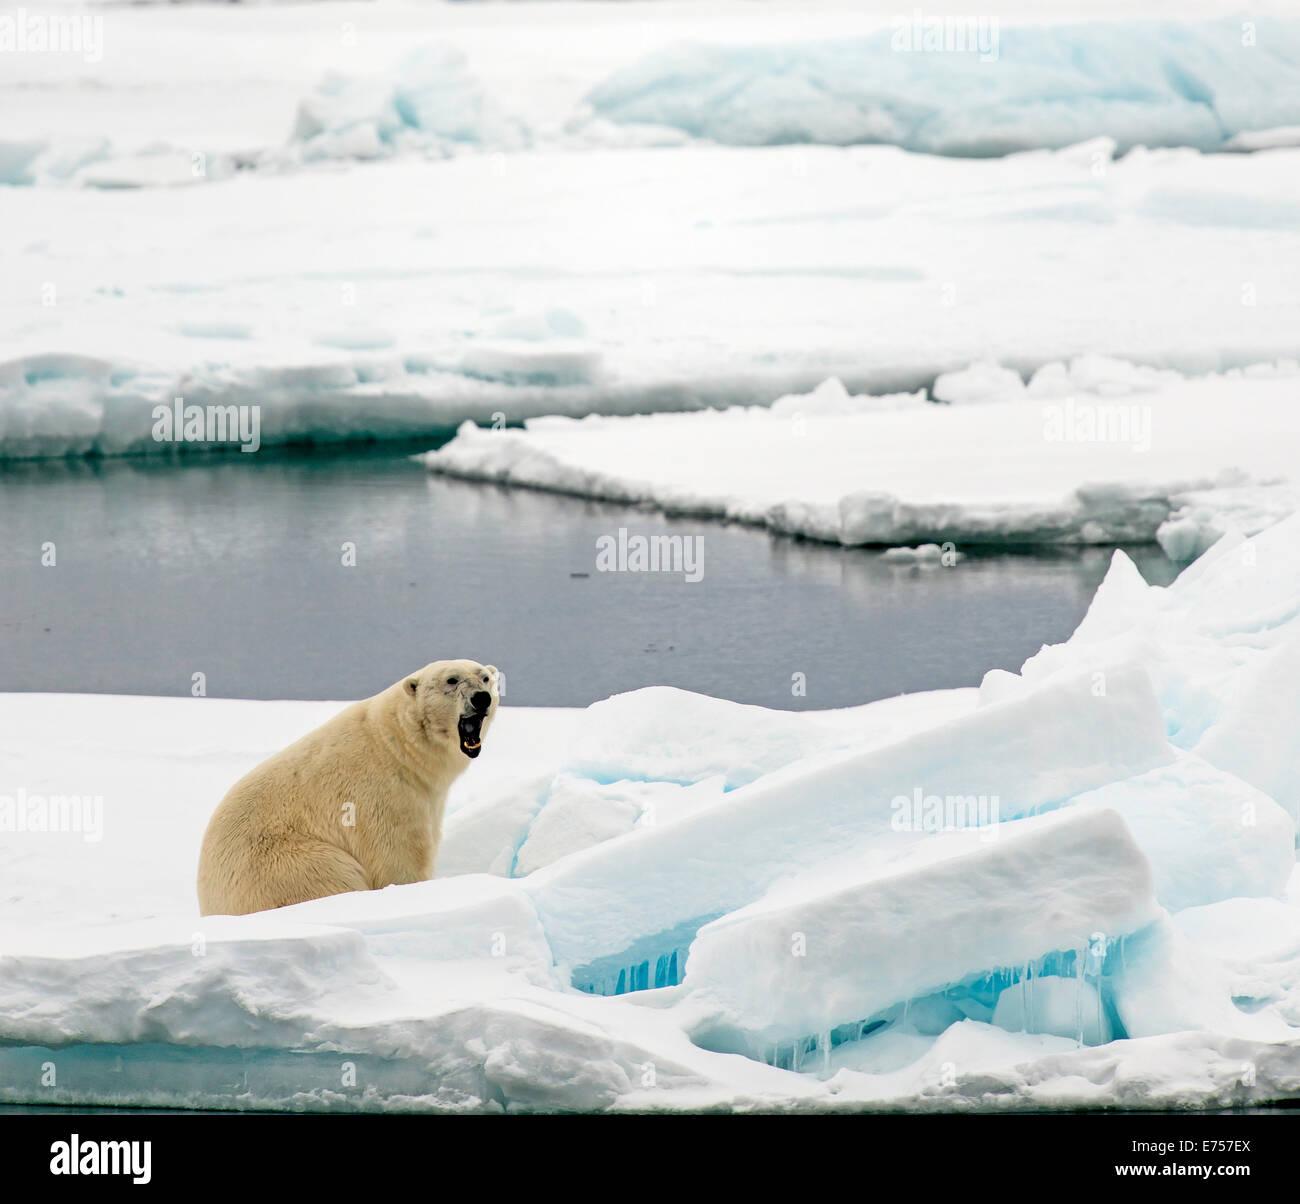 Polar bear (Ursus maritimus) yawning on pack ice Svalbard Norway Arctic Circle Scandinavia Europe - Stock Image